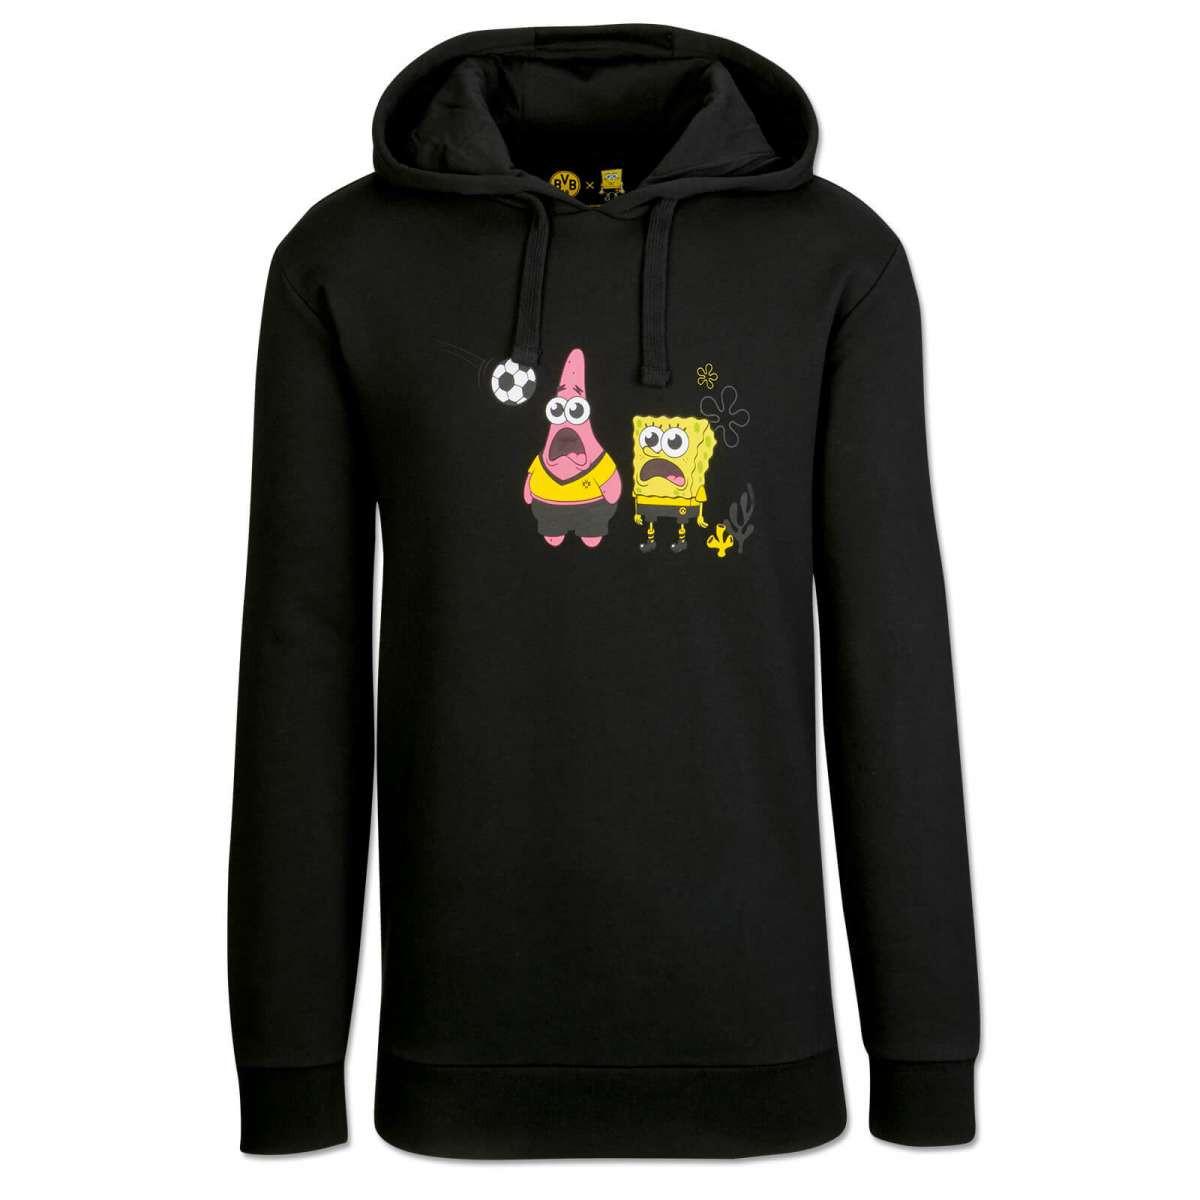 SpongeBob x Borussia Dortmund hoodie black